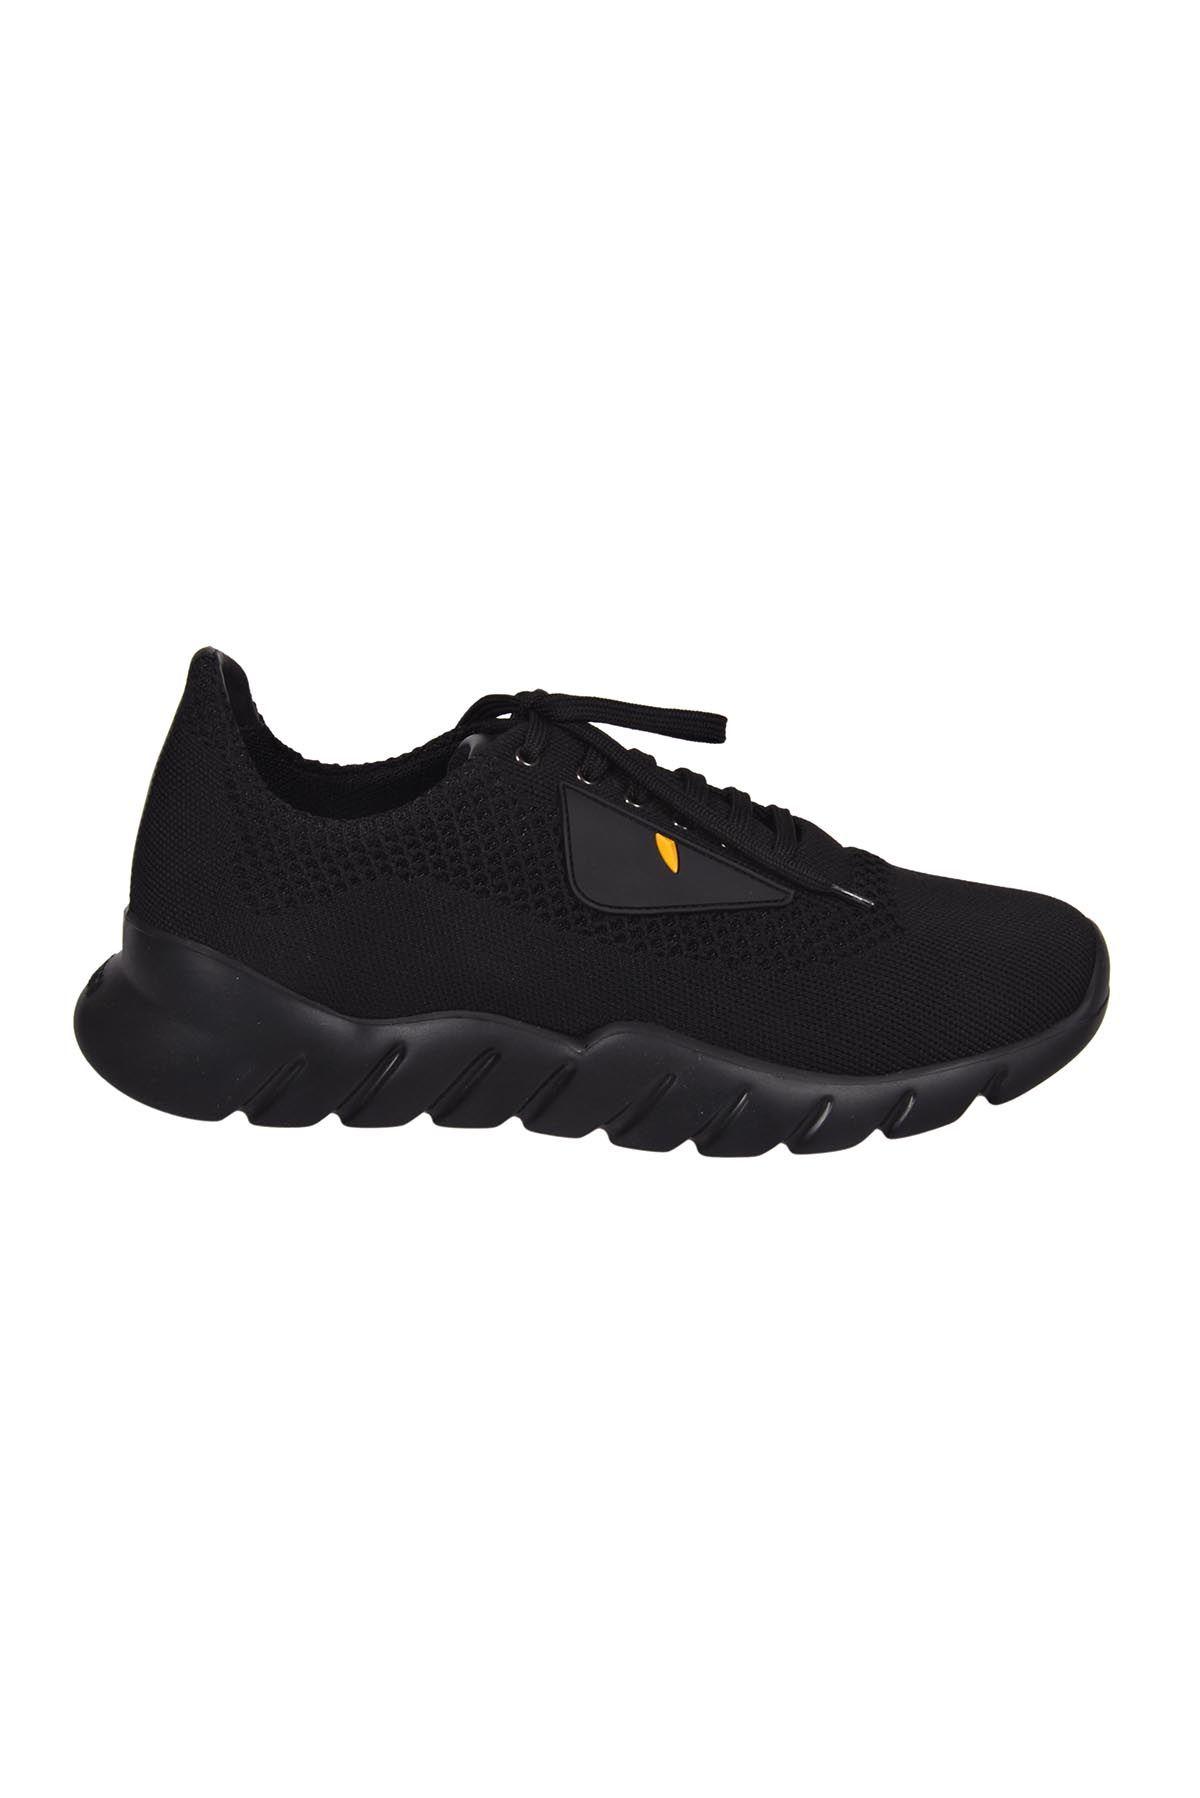 Fendi Tennis Sneakers